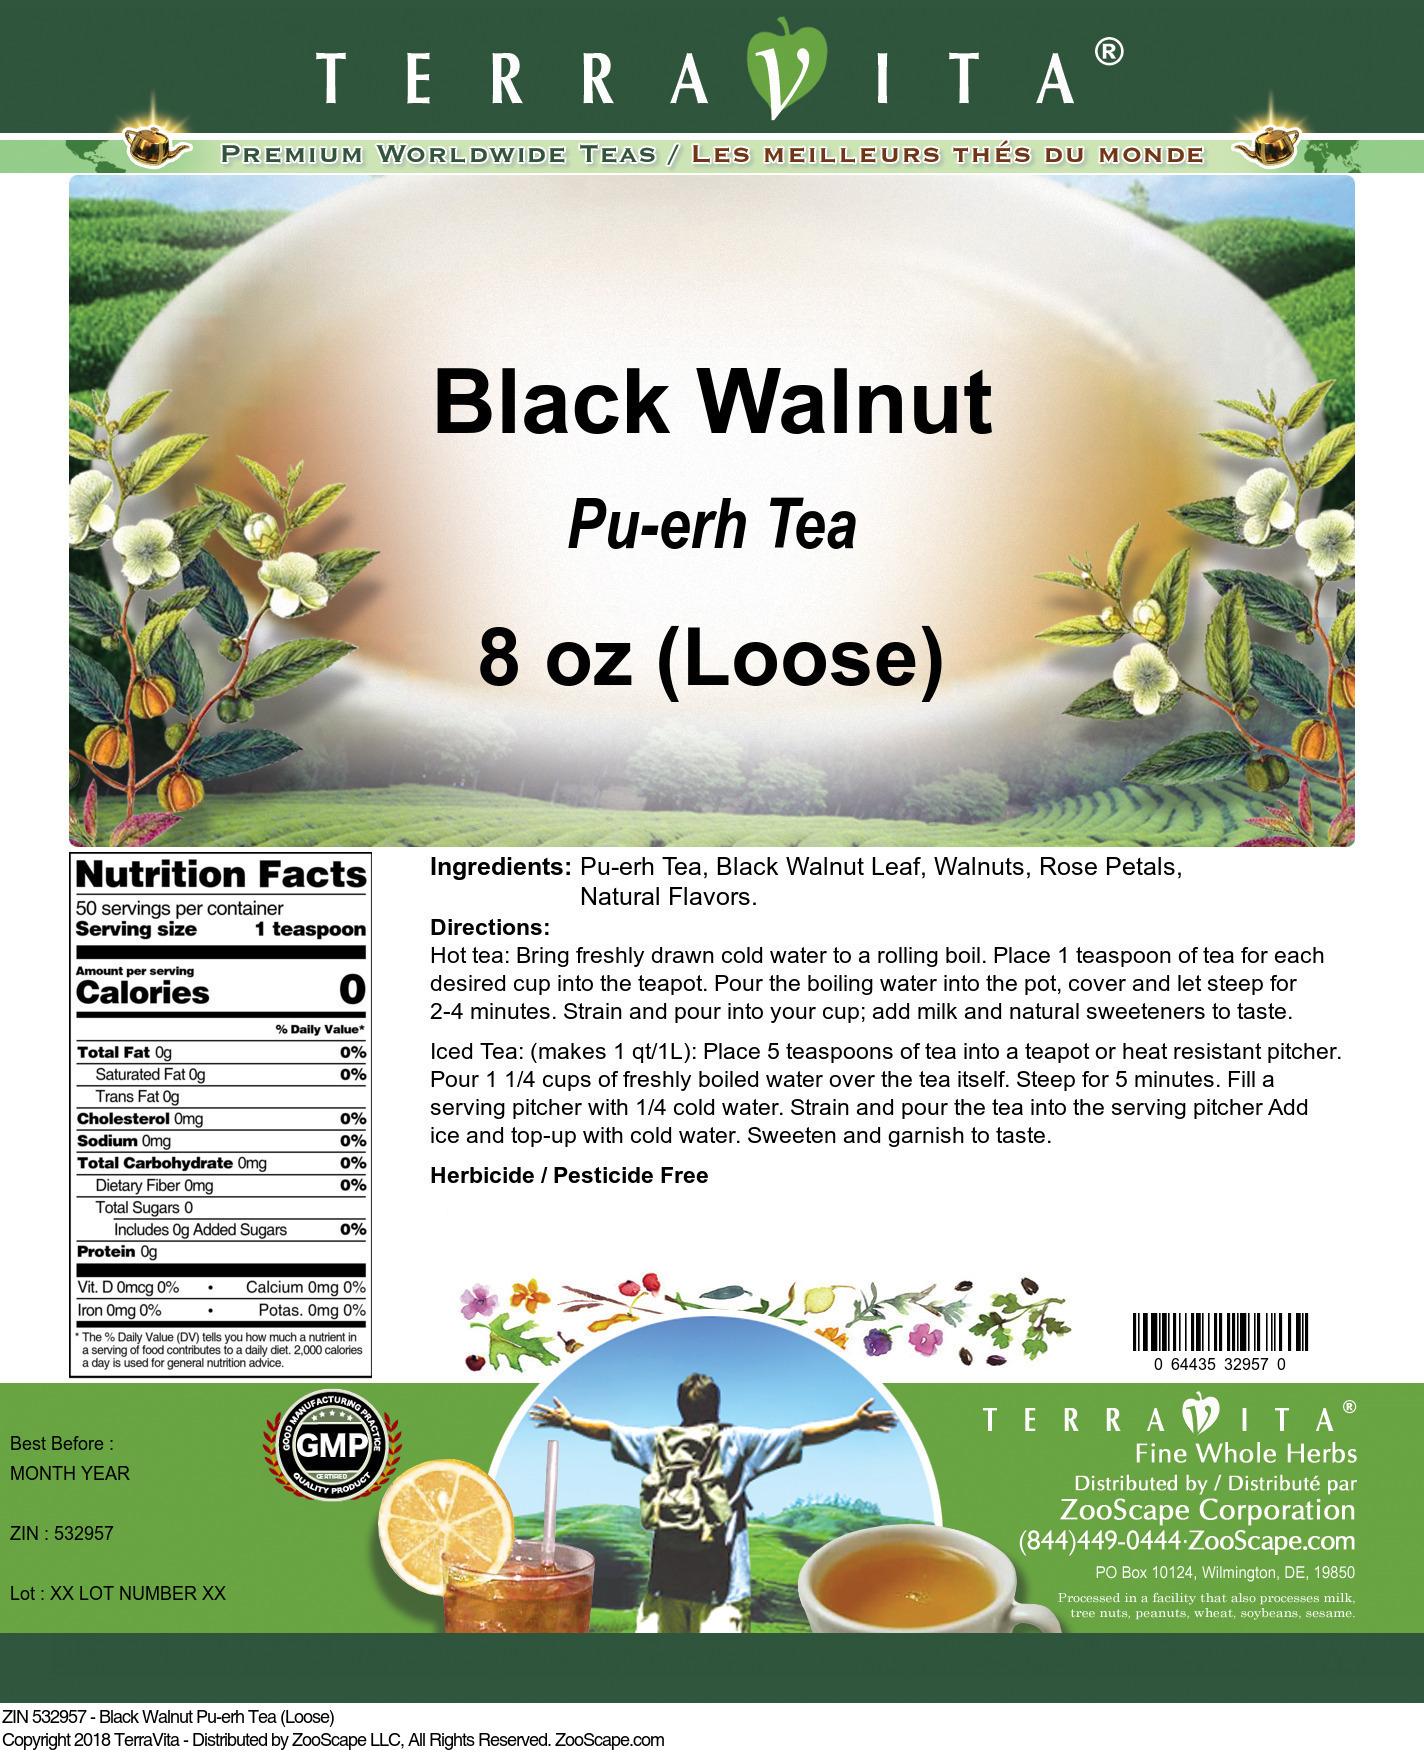 Black Walnut Pu-erh Tea